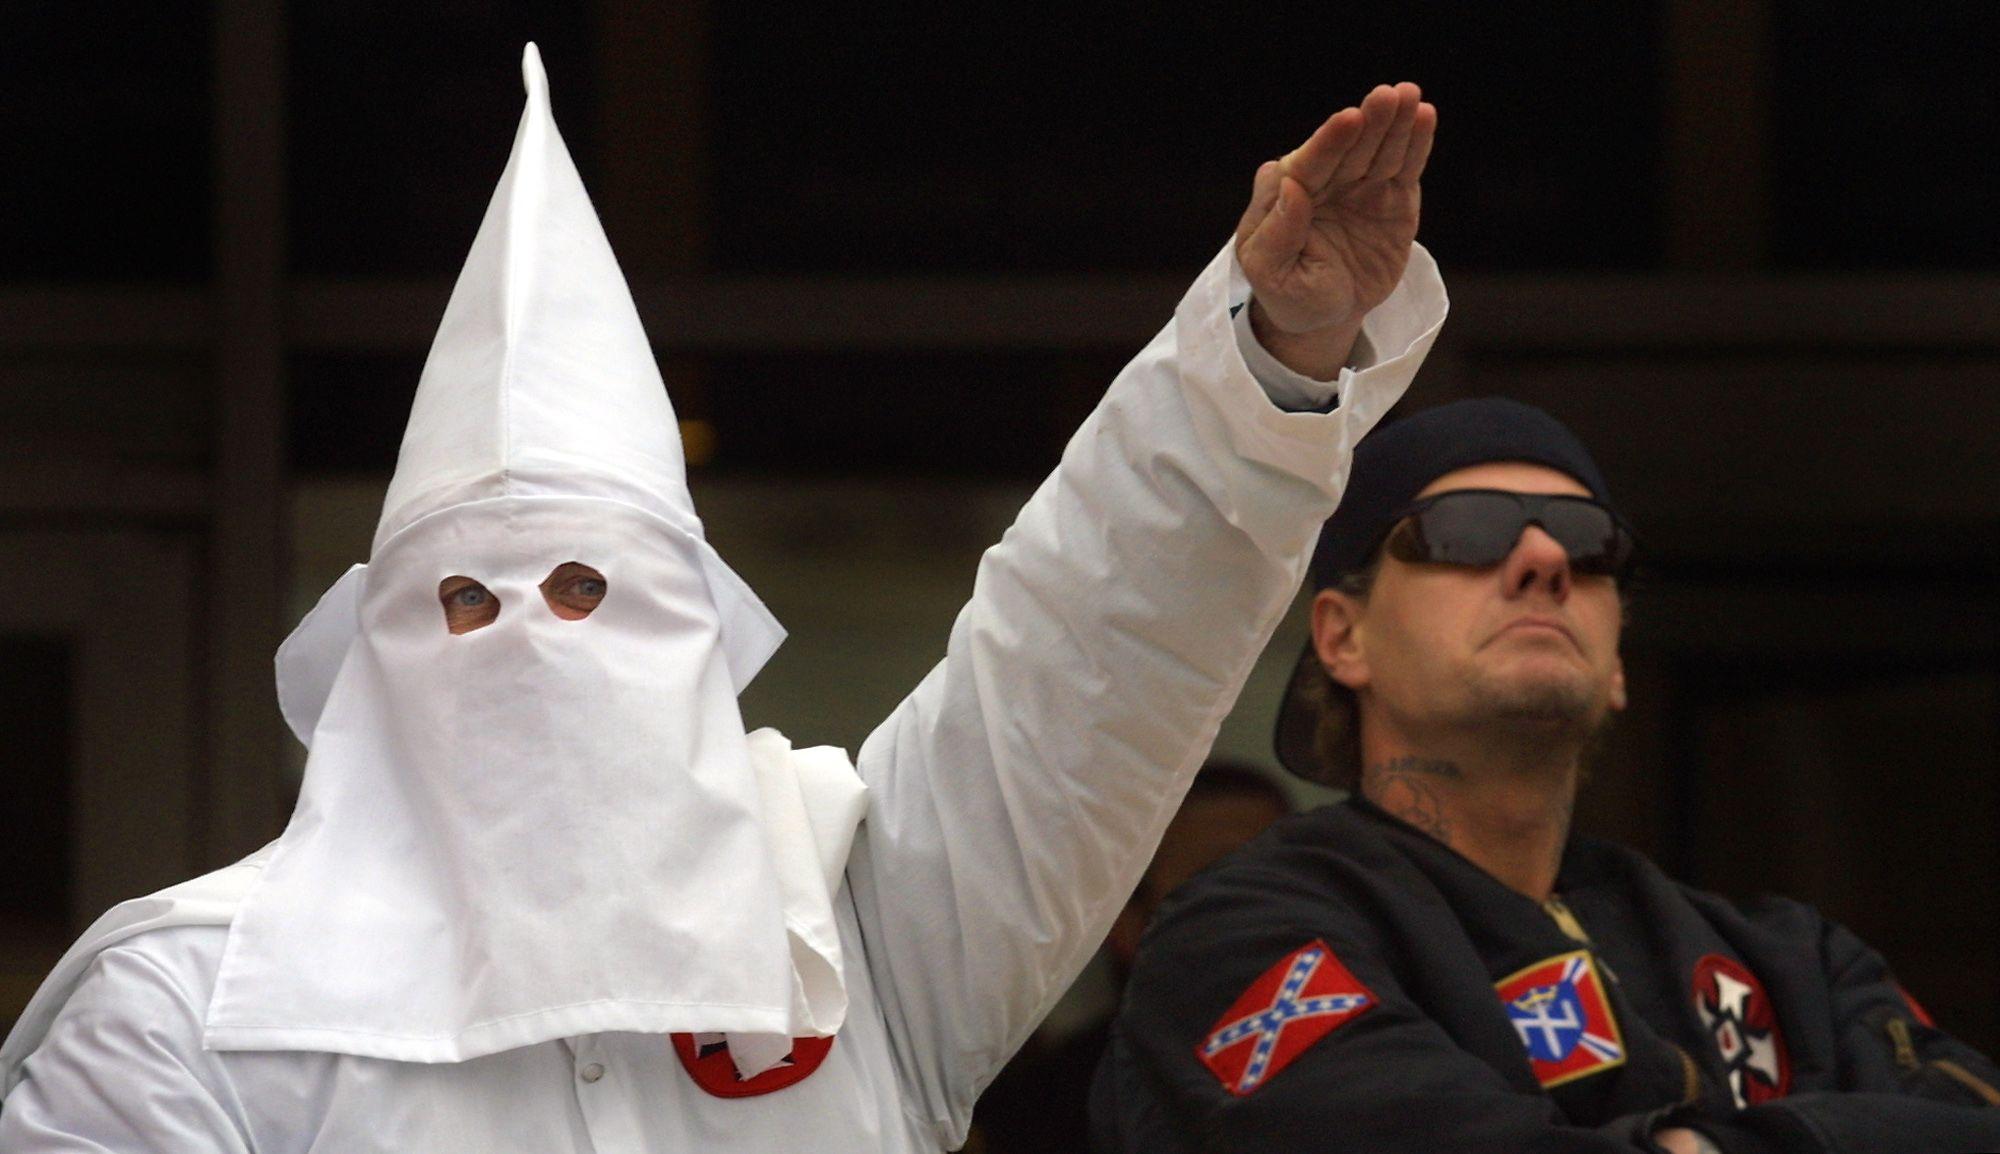 Klansman Hood